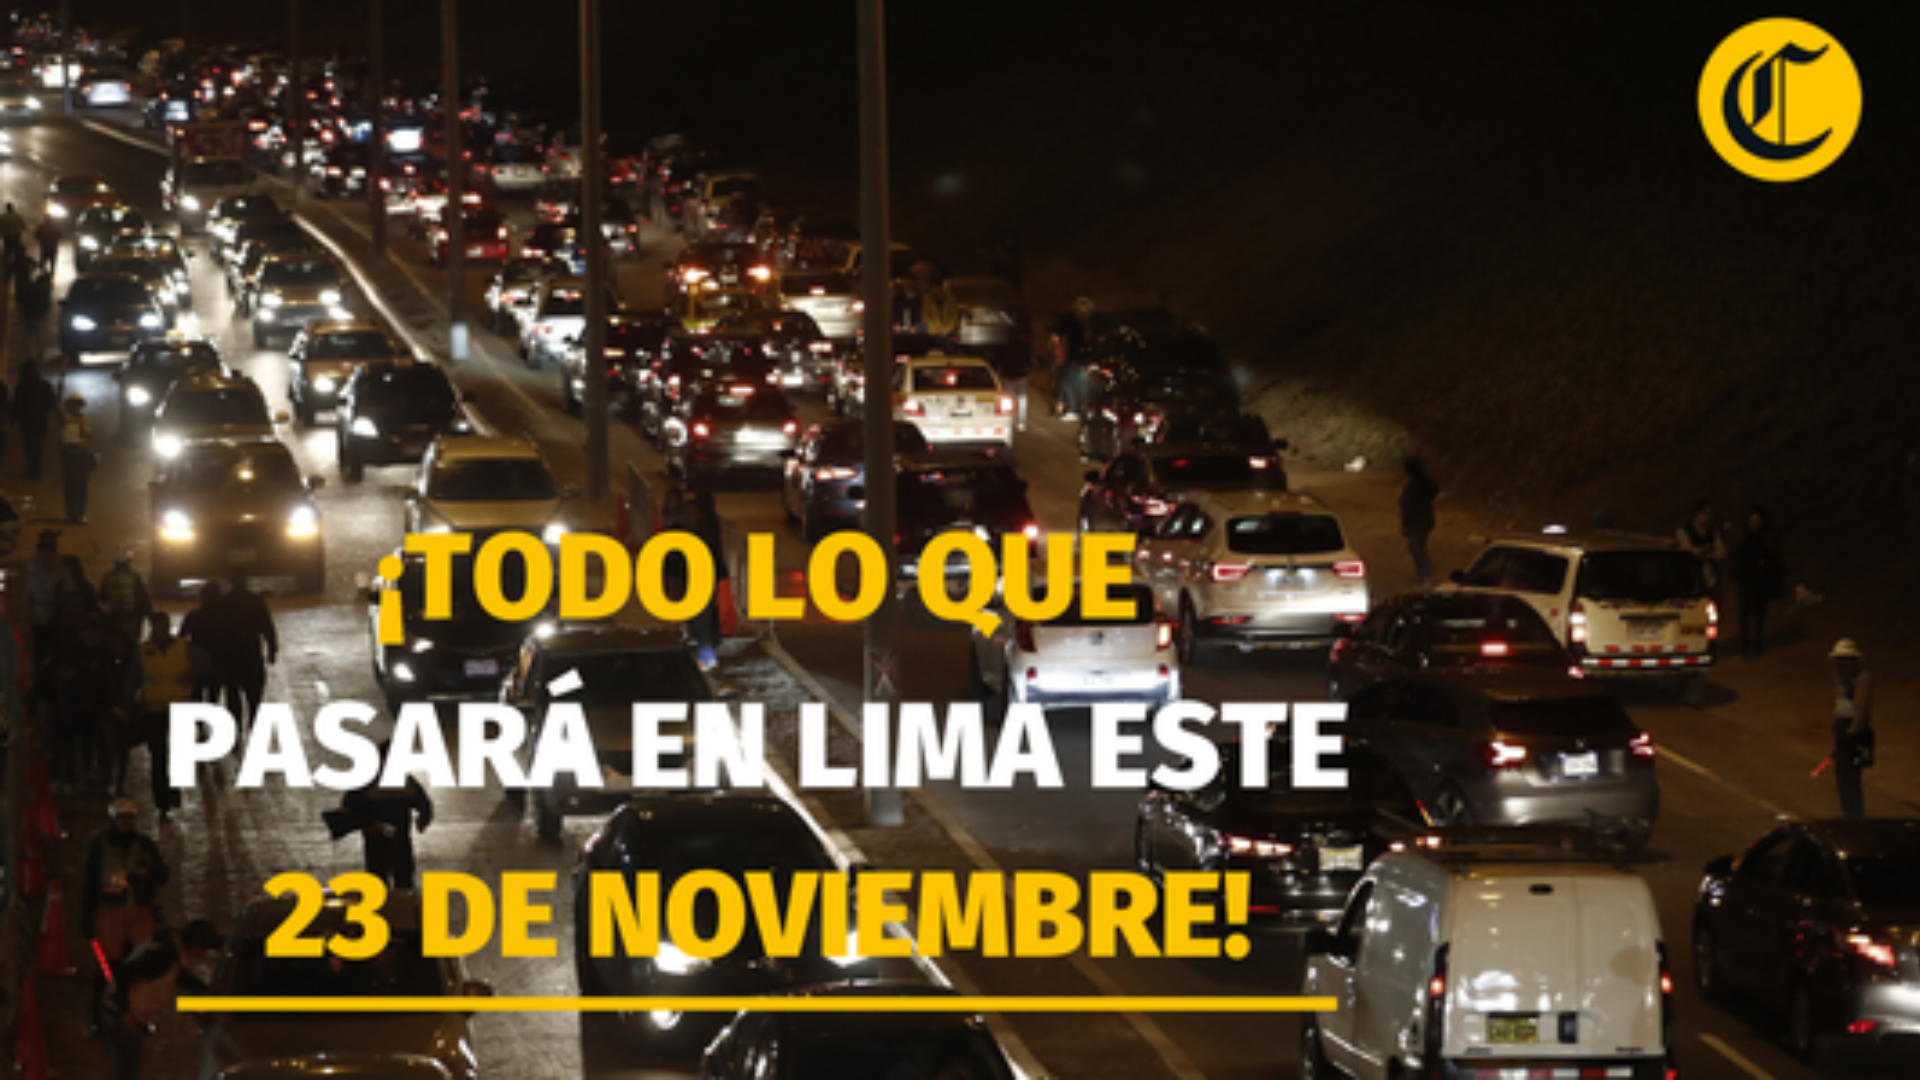 Todo lo que pasará en Lima este 23 de noviembre